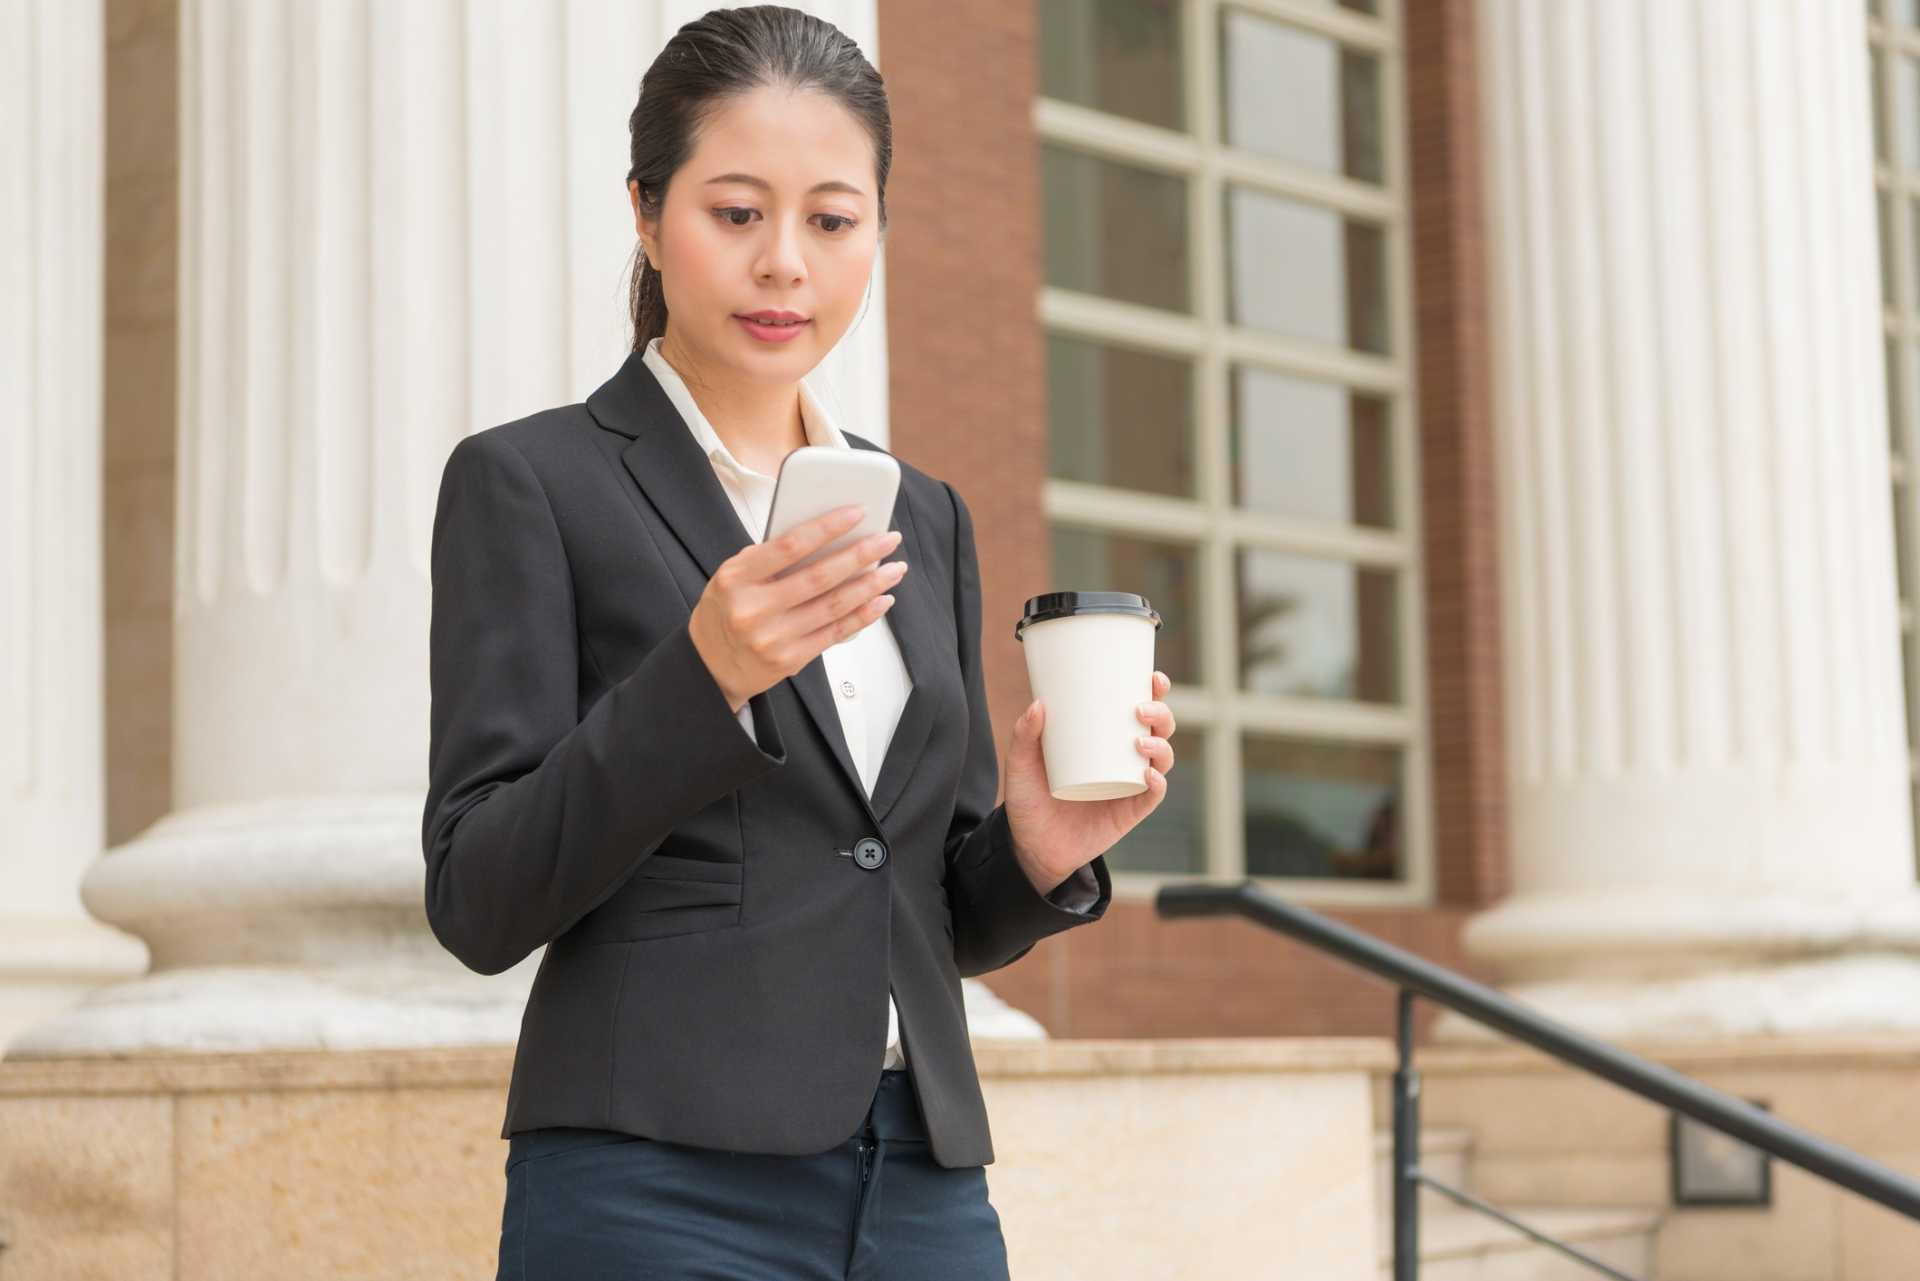 government worker smartphone.jpg